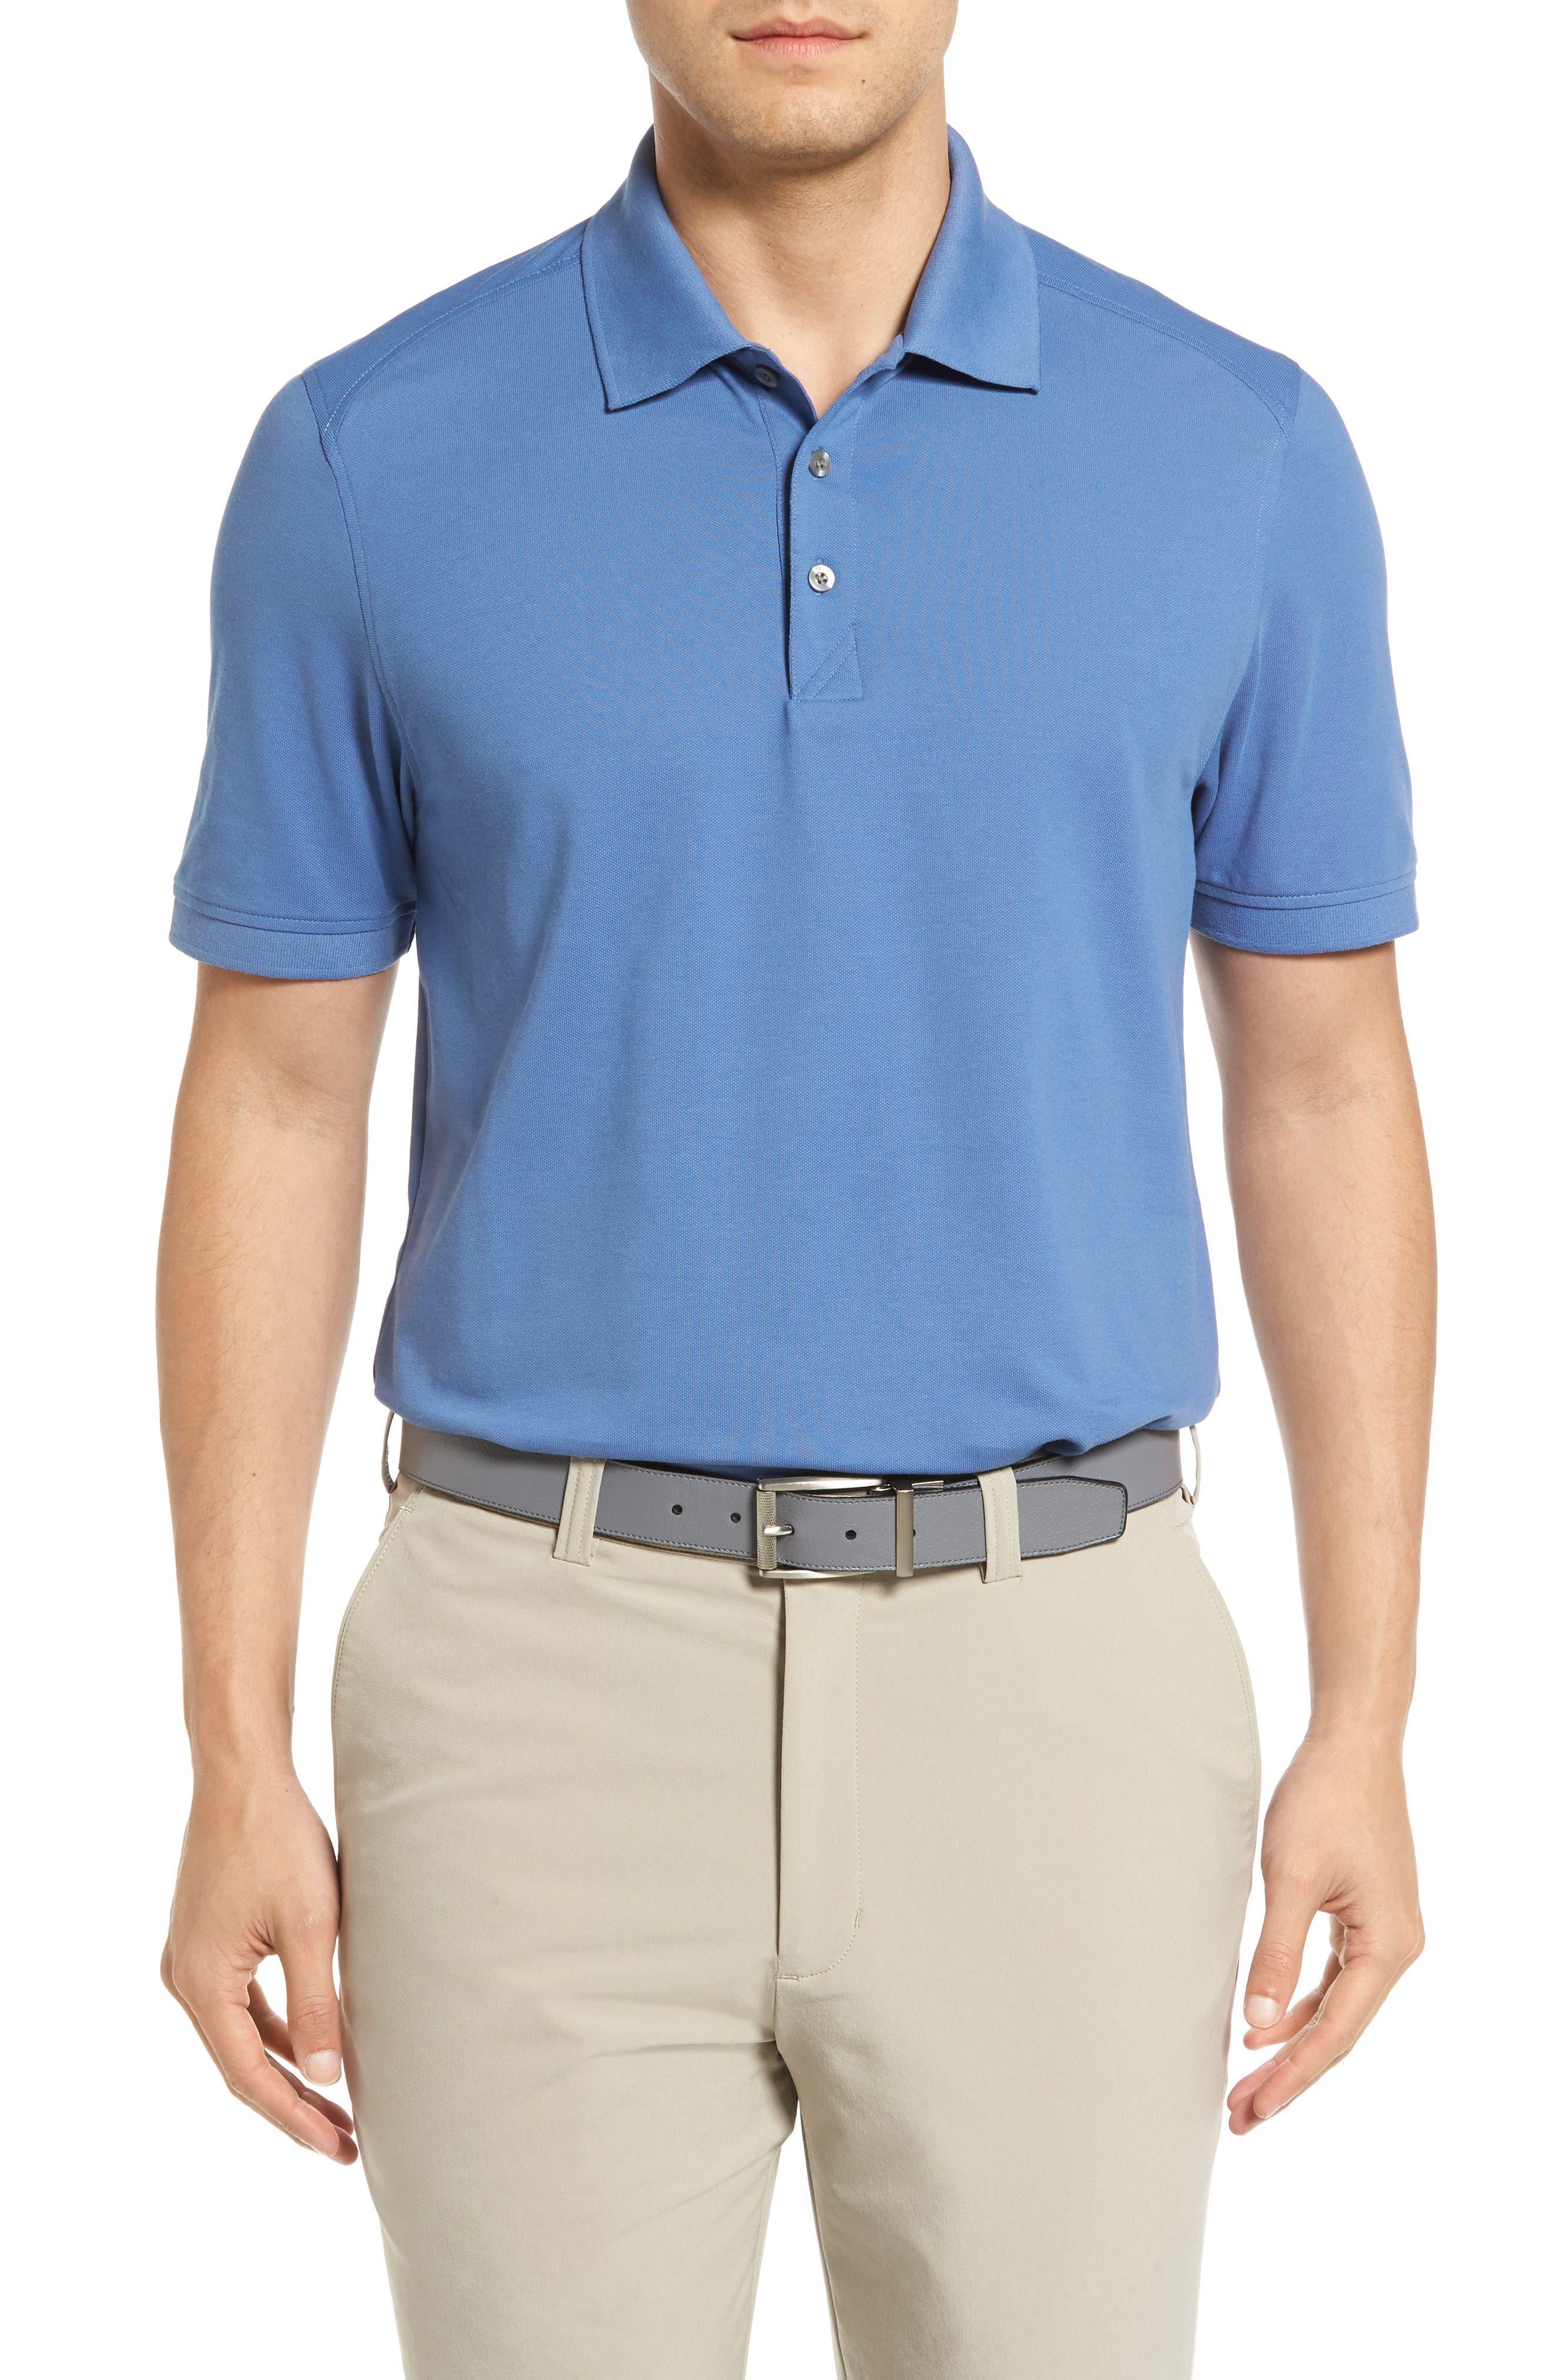 Cutter & Buck Advantage Golf Polo (Big & Tall)